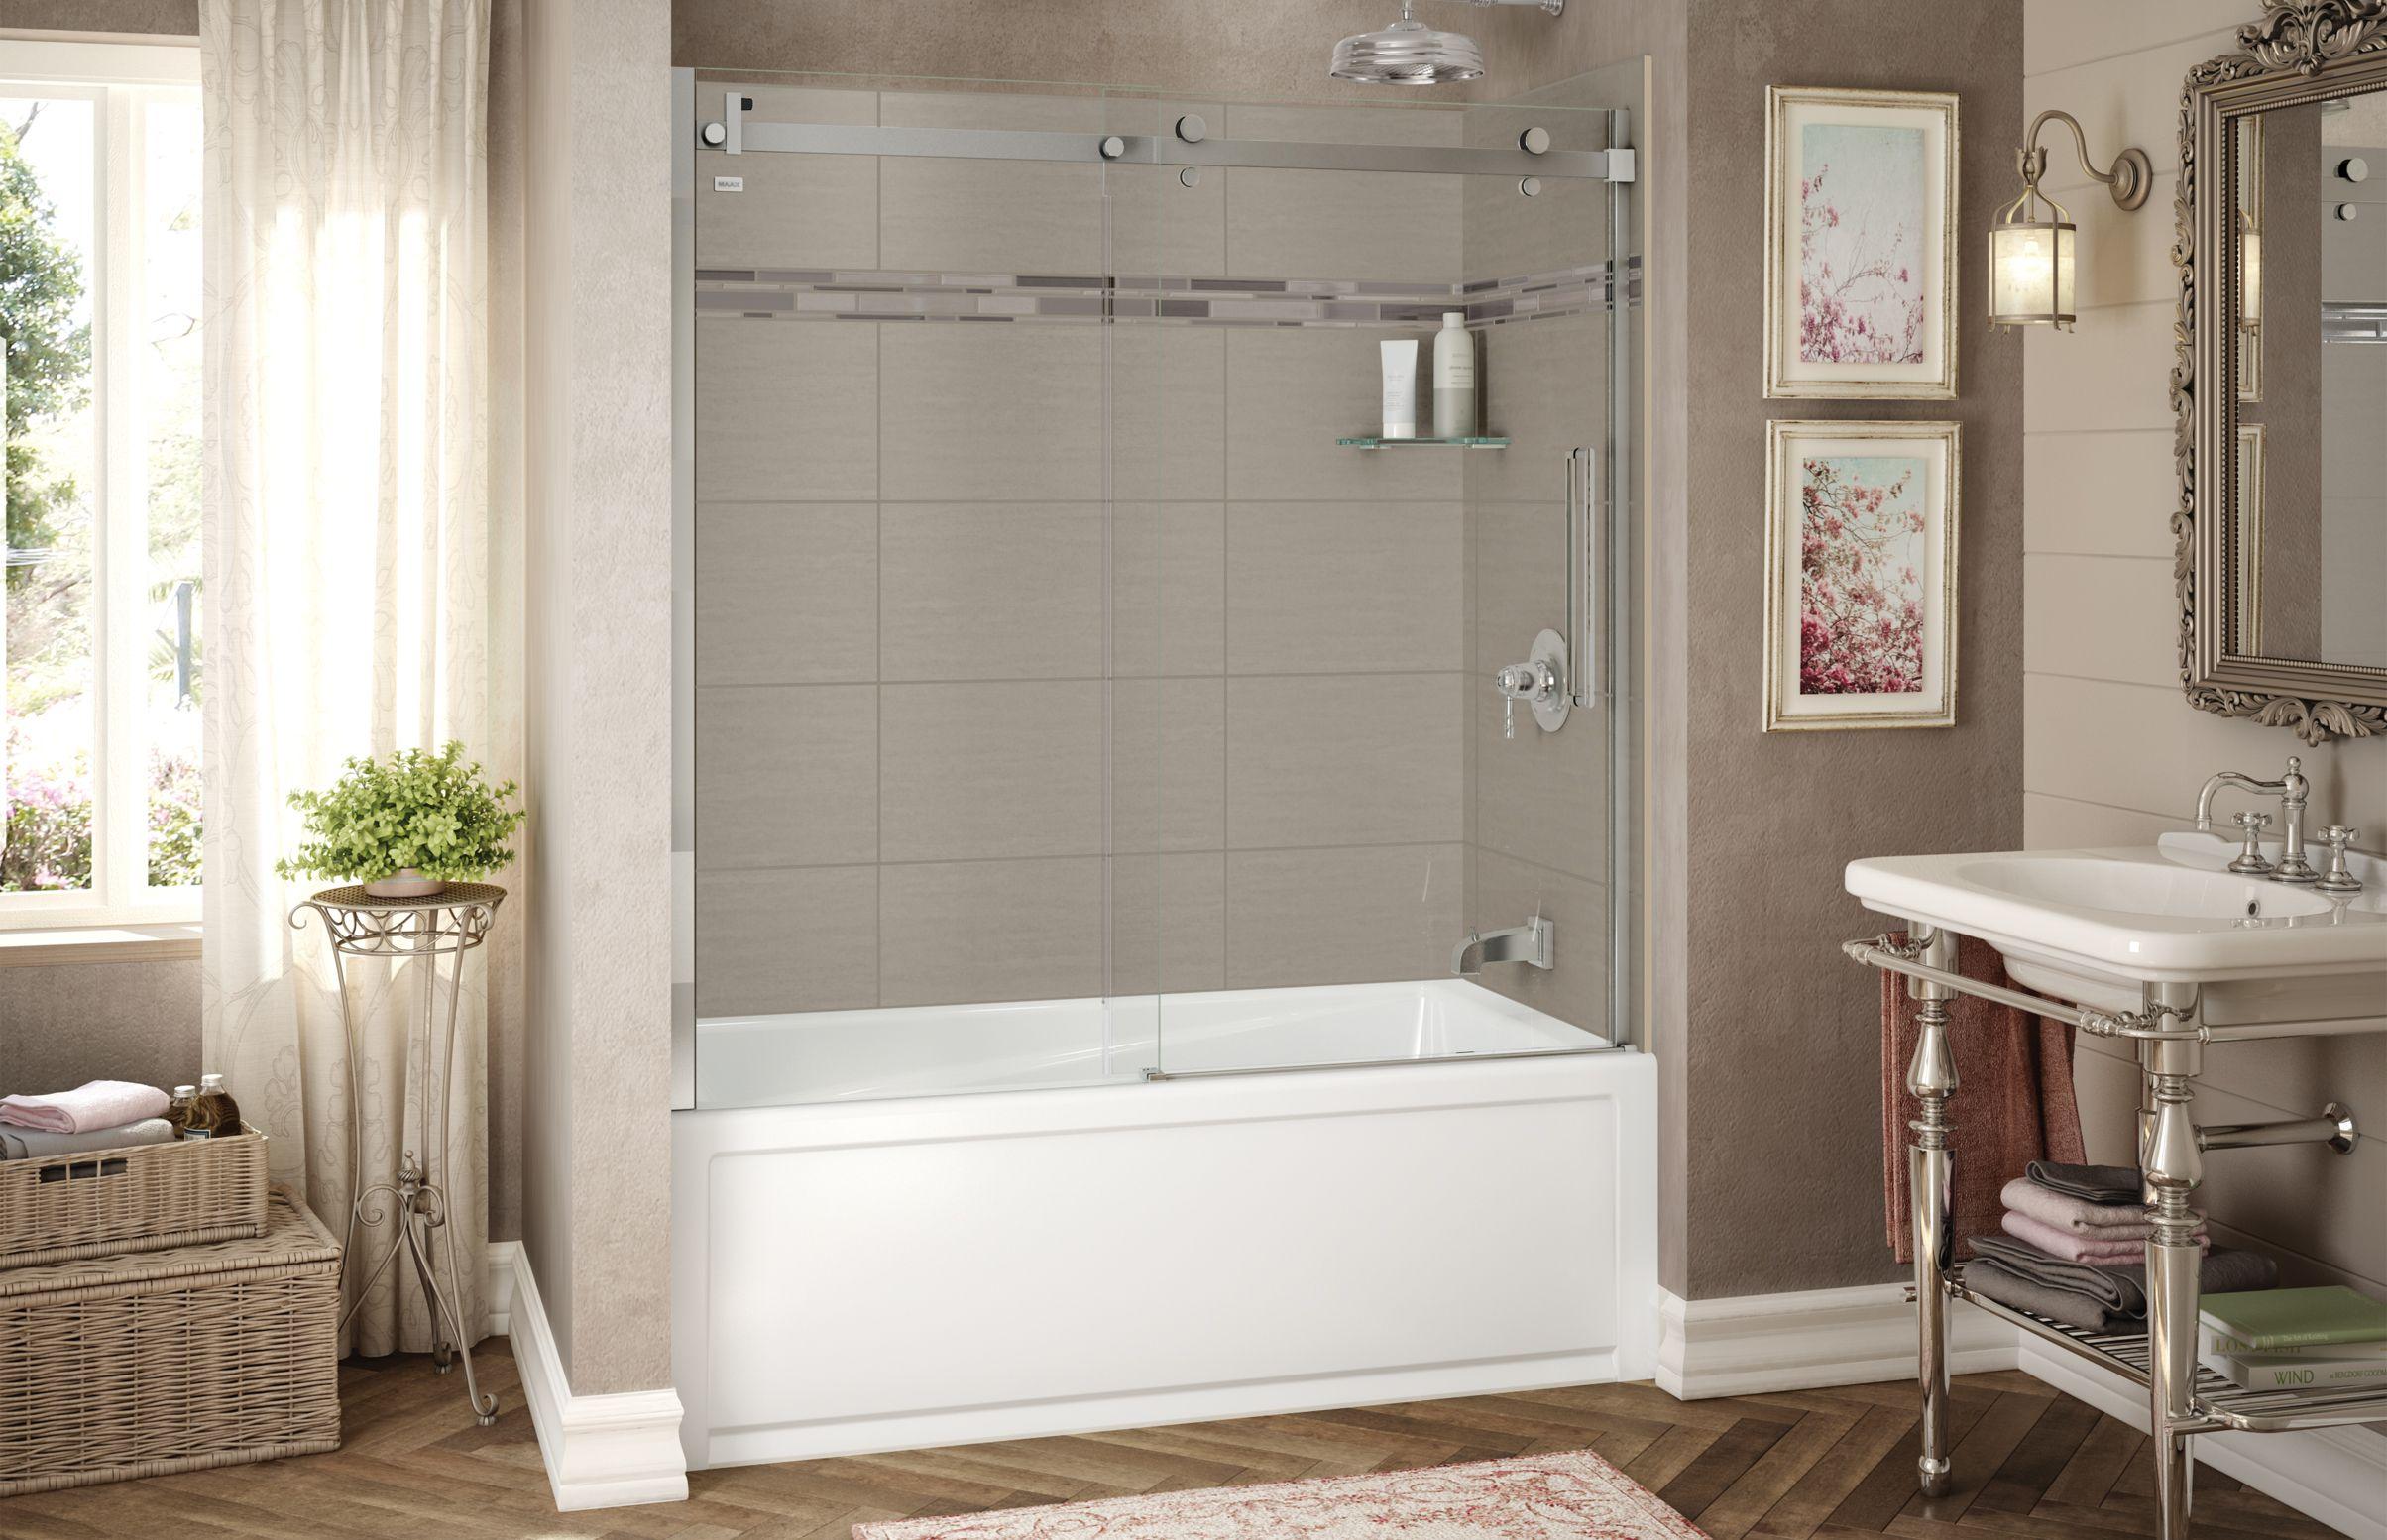 Magnificent Bain Maax Photos - Bathroom and Shower Ideas - purosion.com